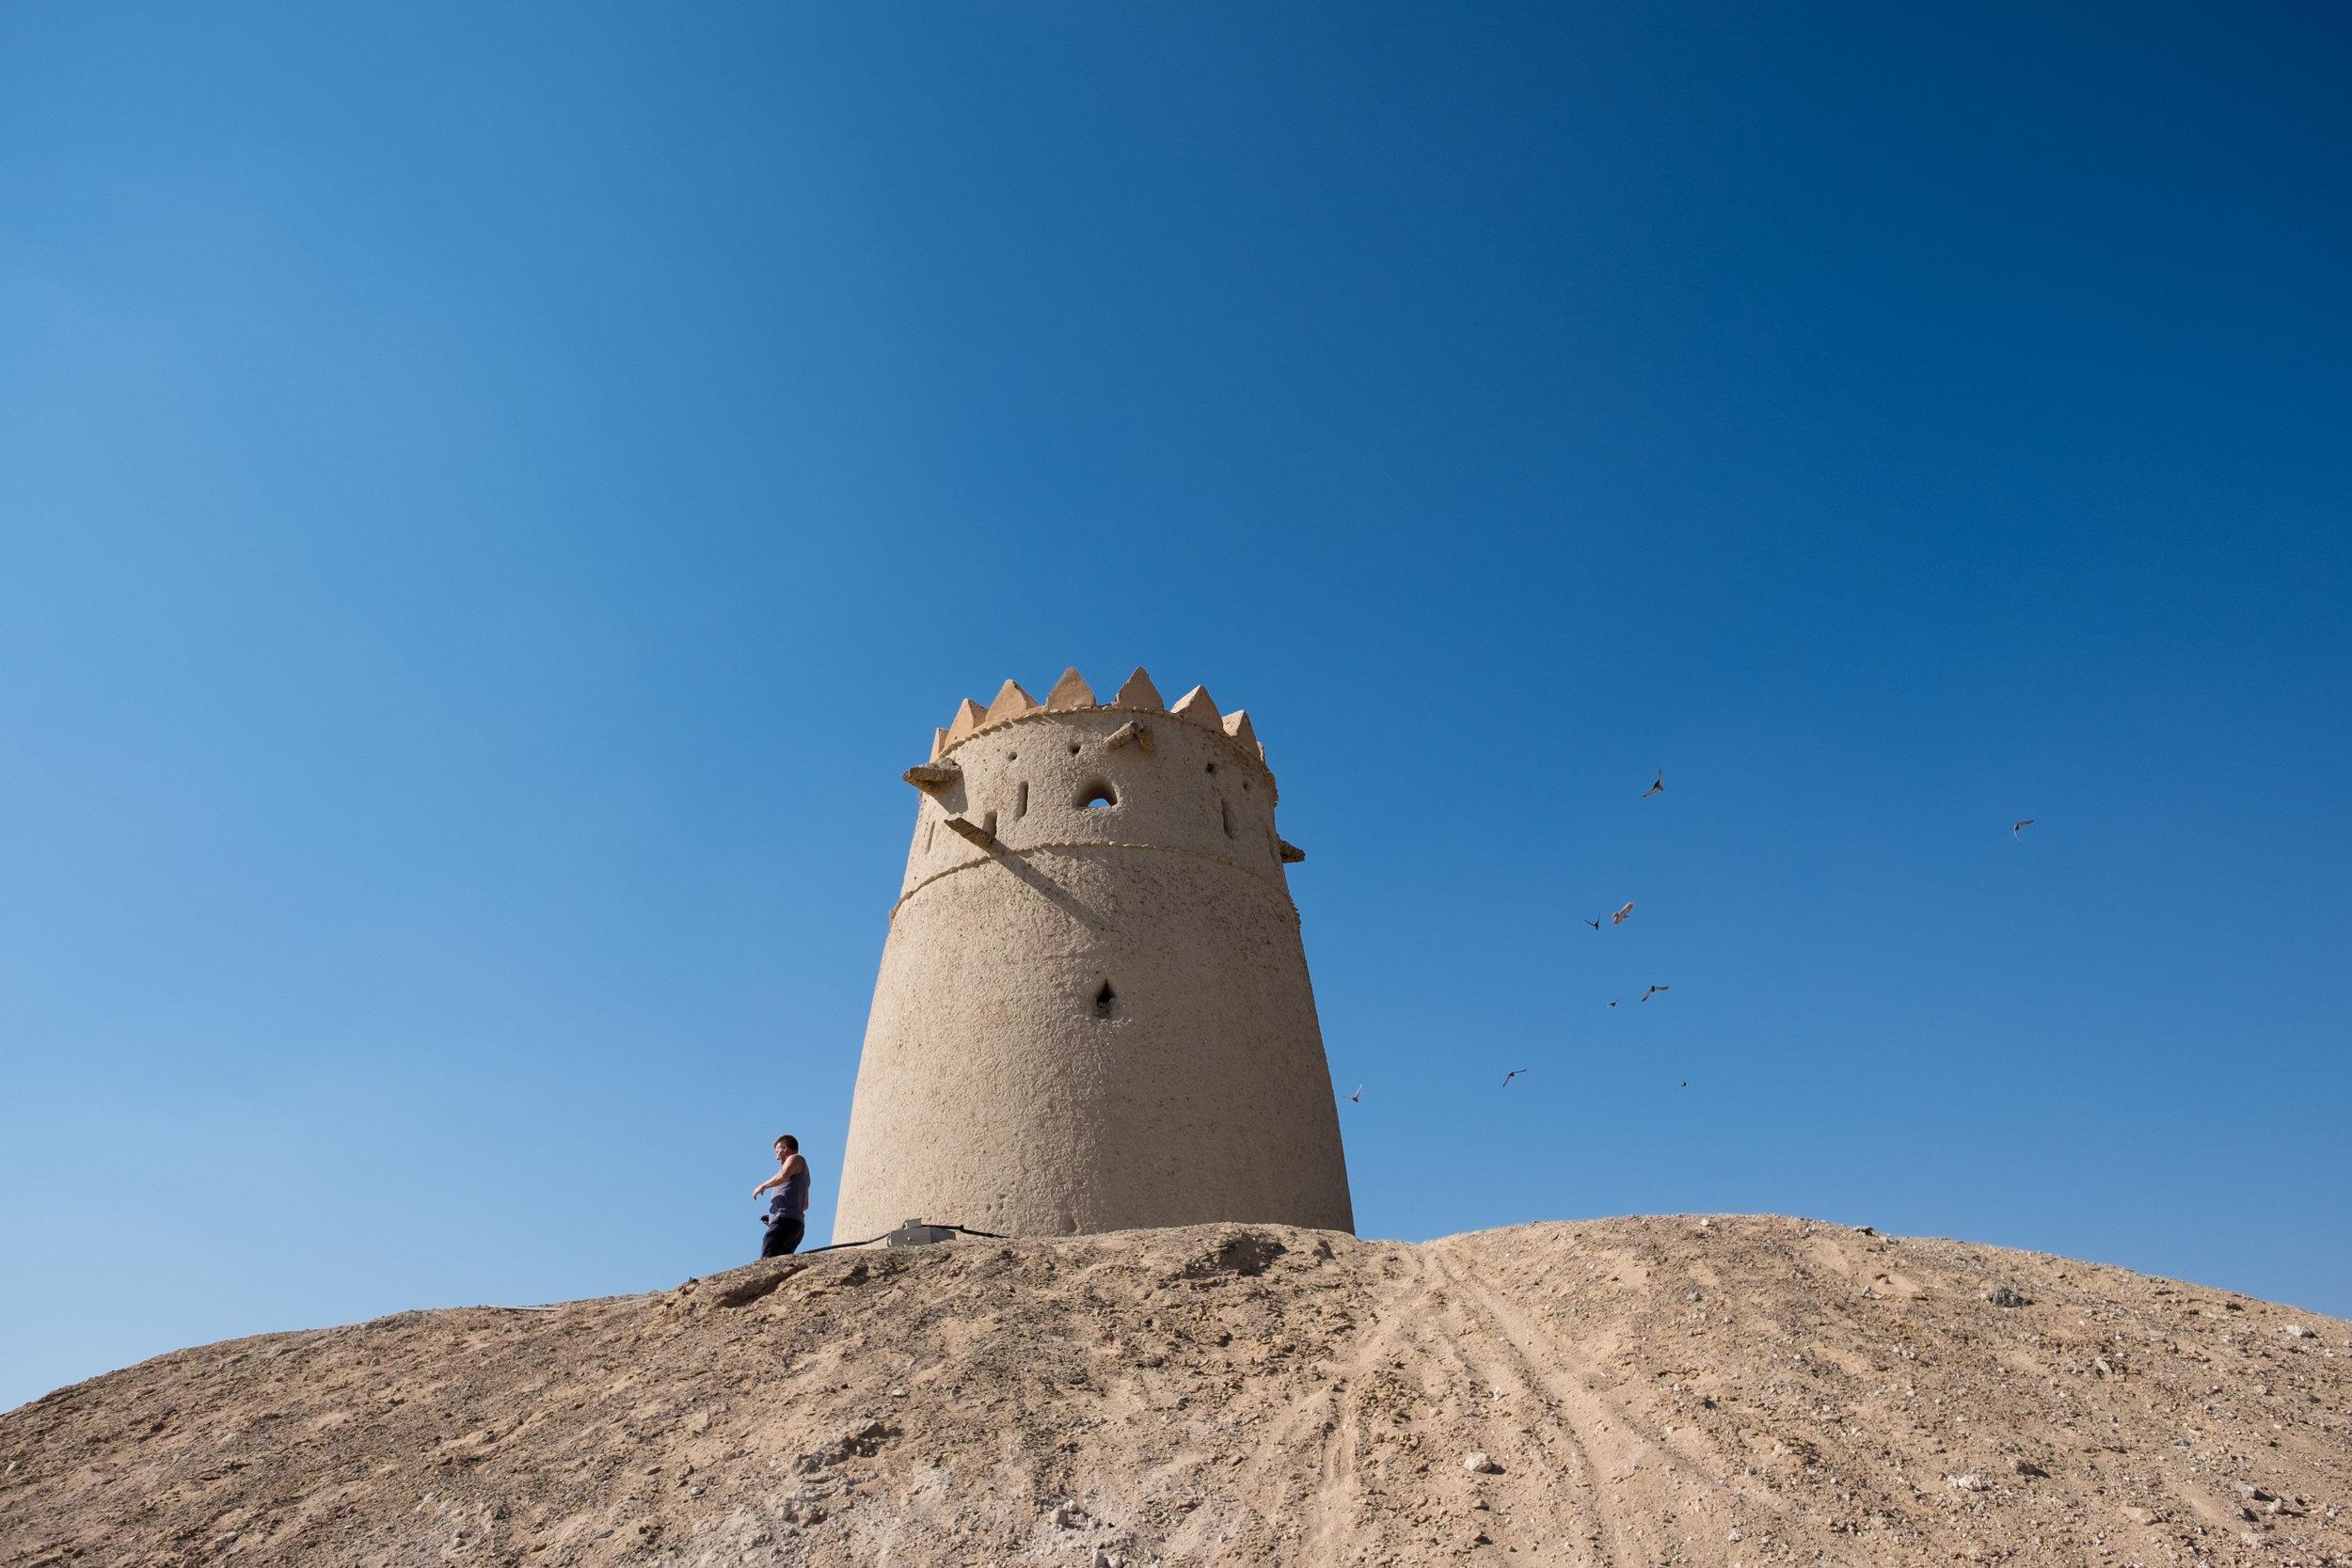 al-ain-outskirts-6100.jpg